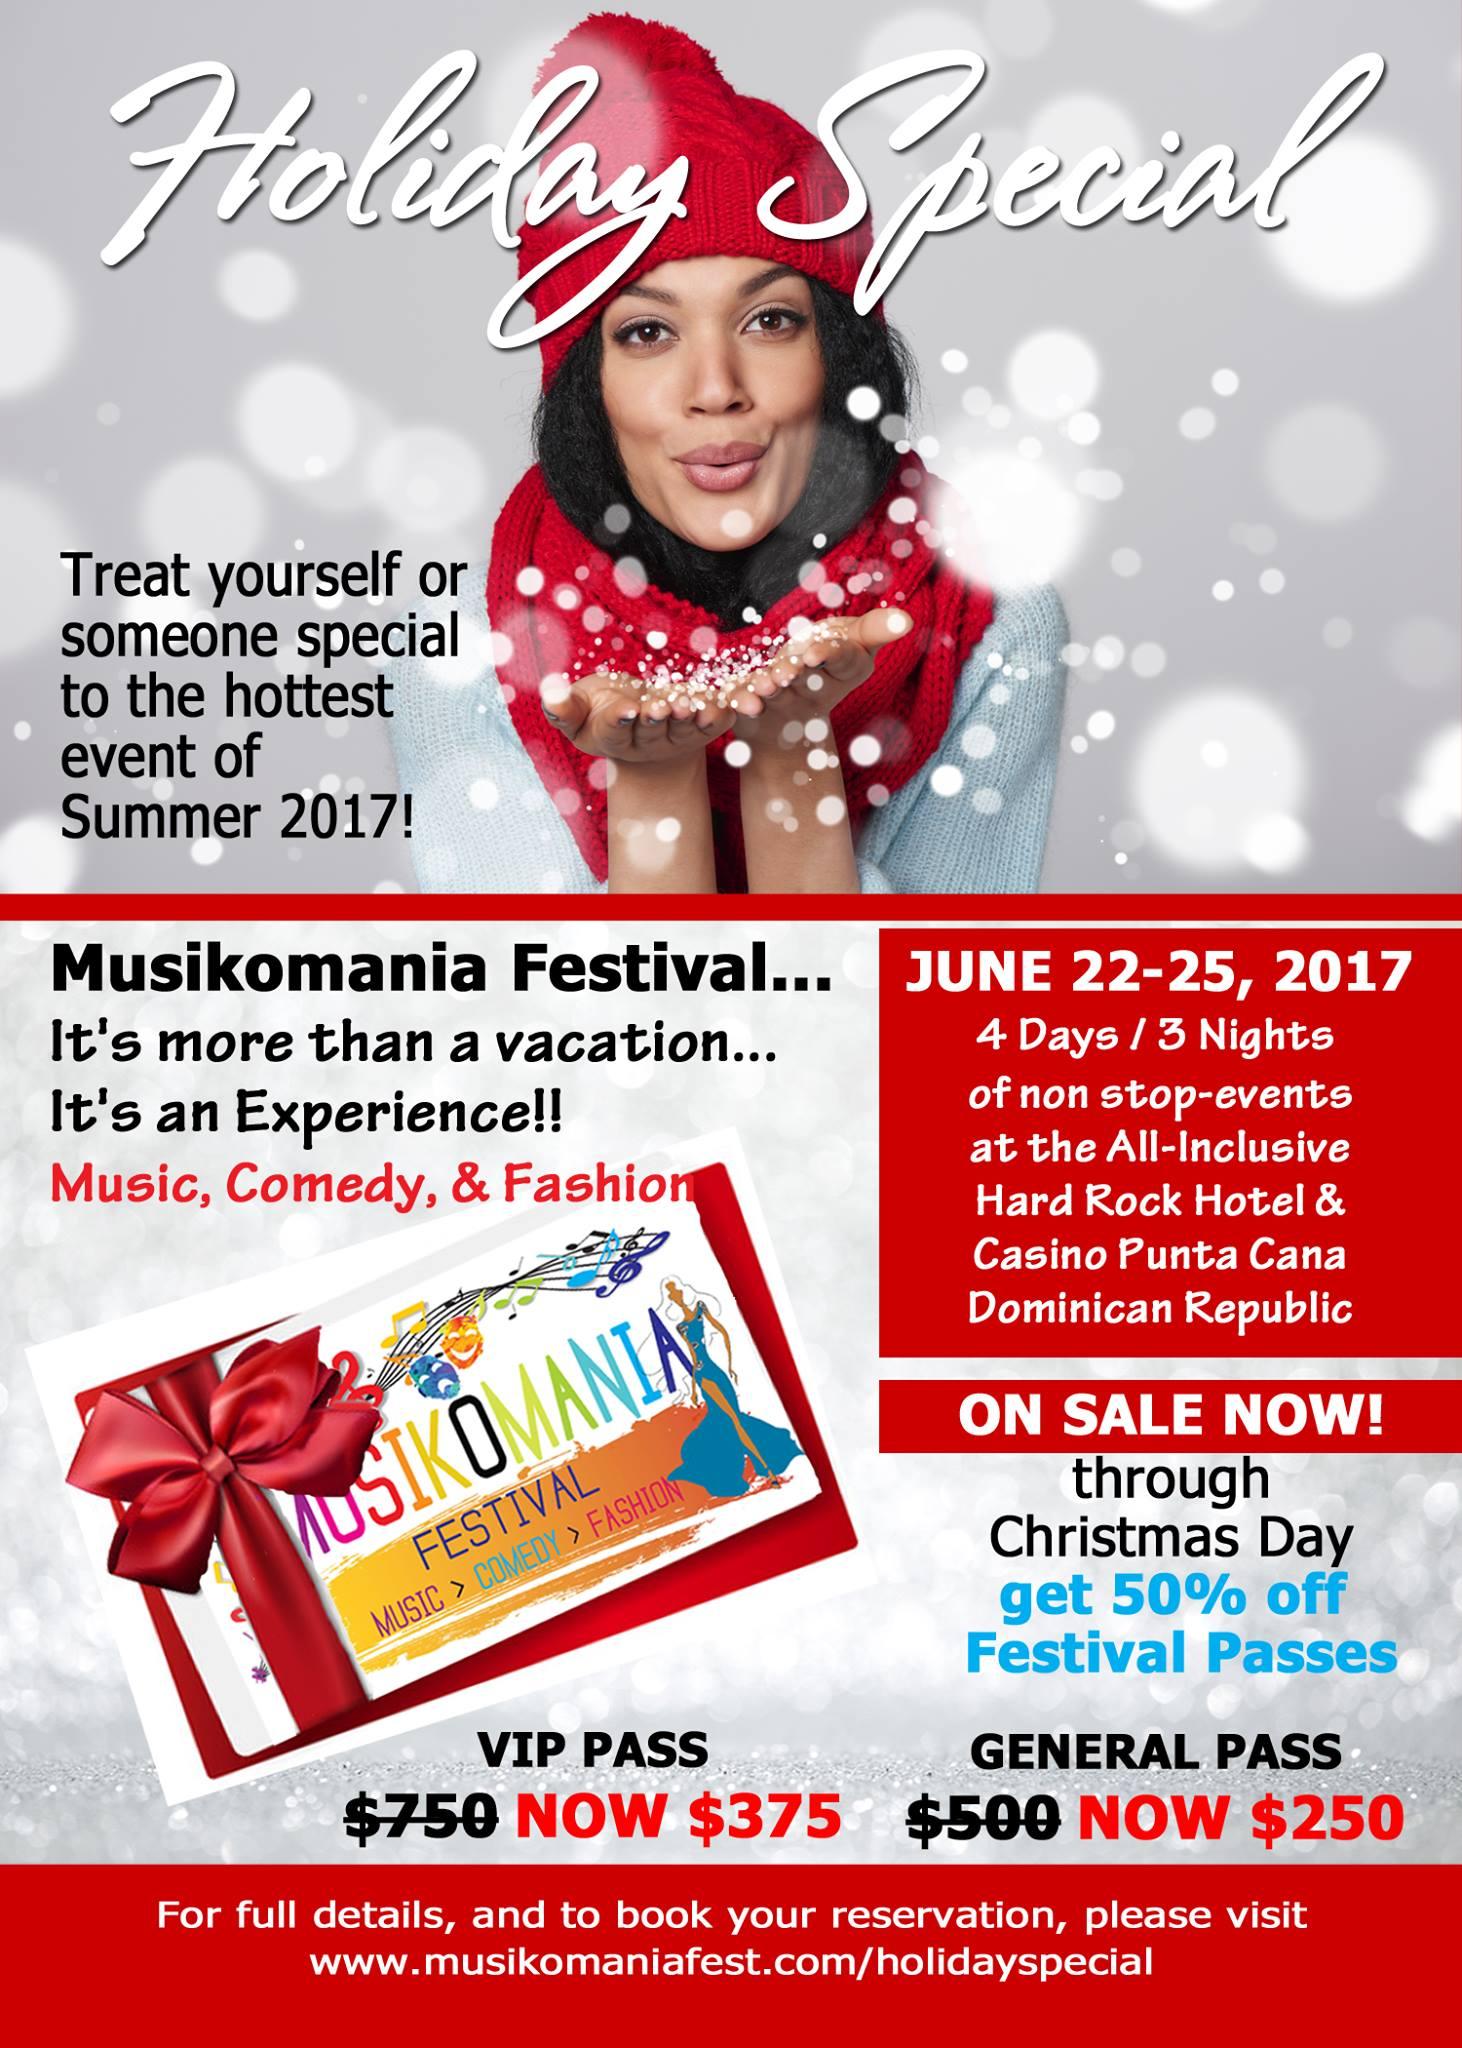 Musikomania Festival Holiday Special Postcard